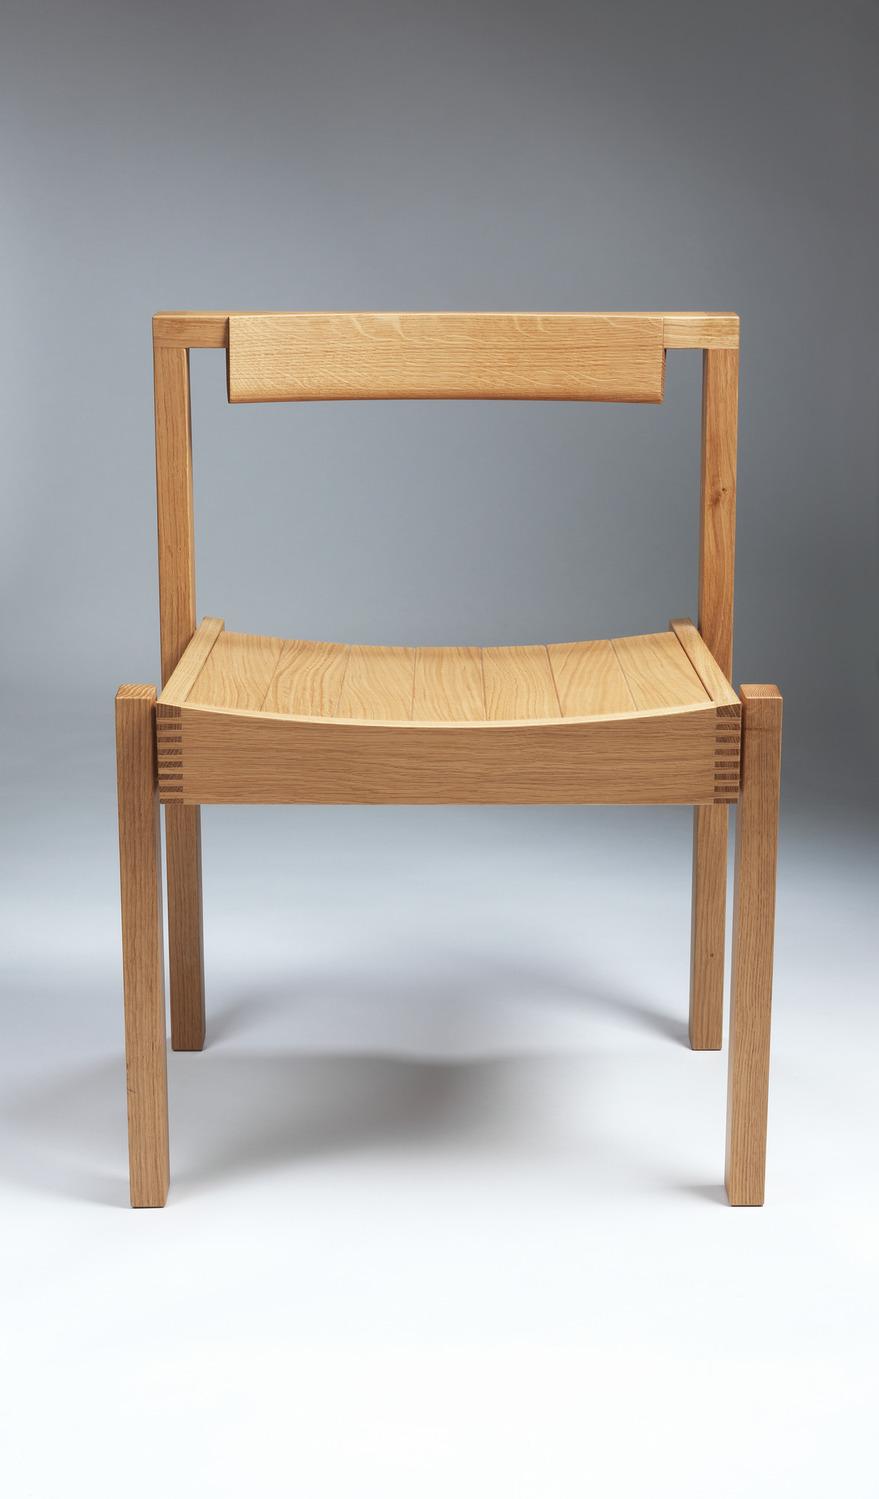 Luke Hughes Coventry Chair in European Oak - Front